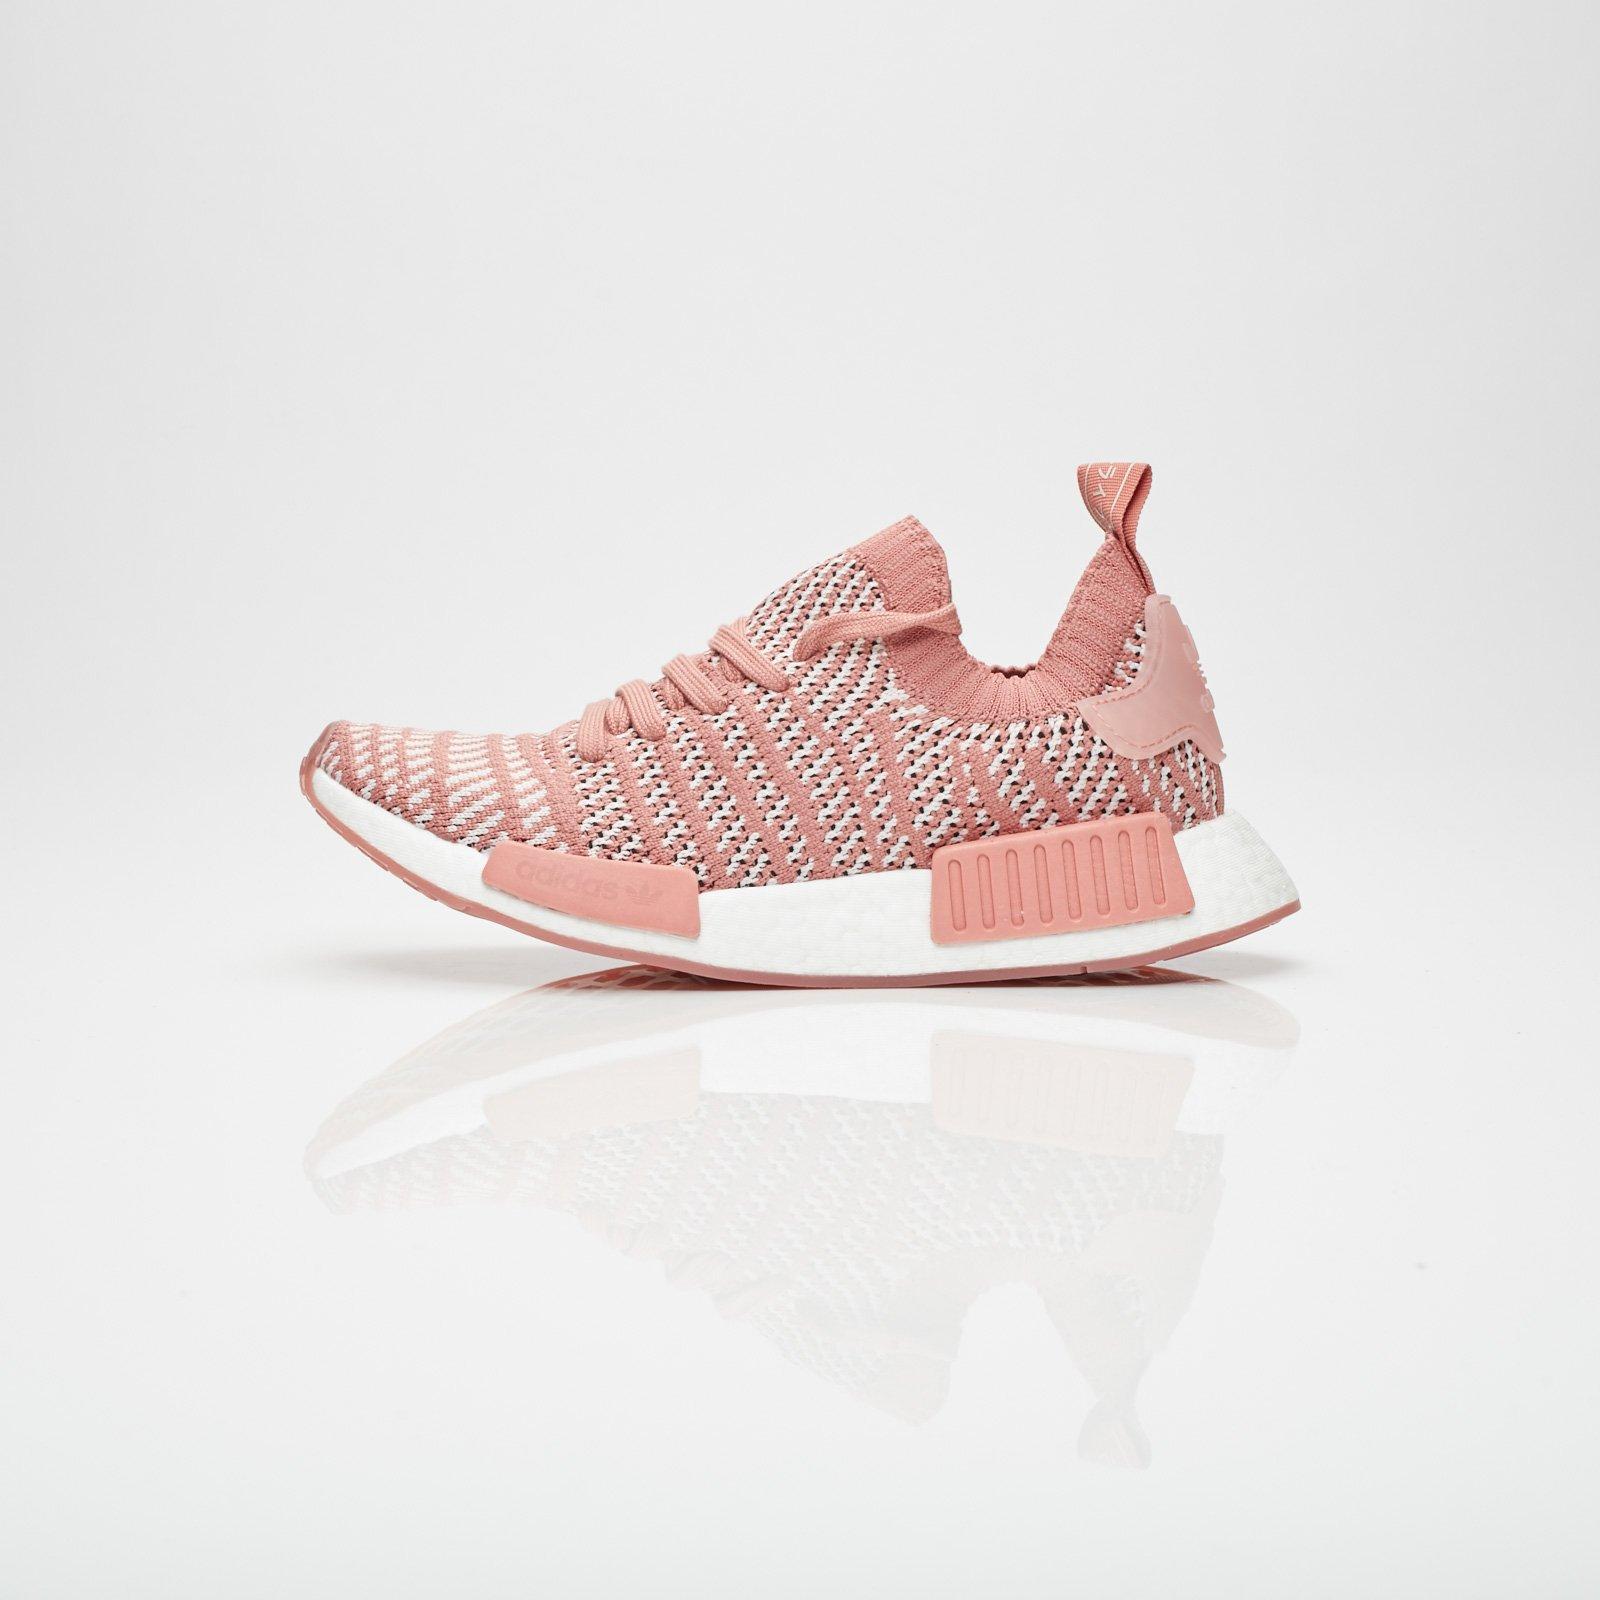 detailing c0173 e59ab adidas NMD R1 STLT Primeknit Womens - Cq2028 - Sneakersnstuff   sneakers    streetwear online since 1999